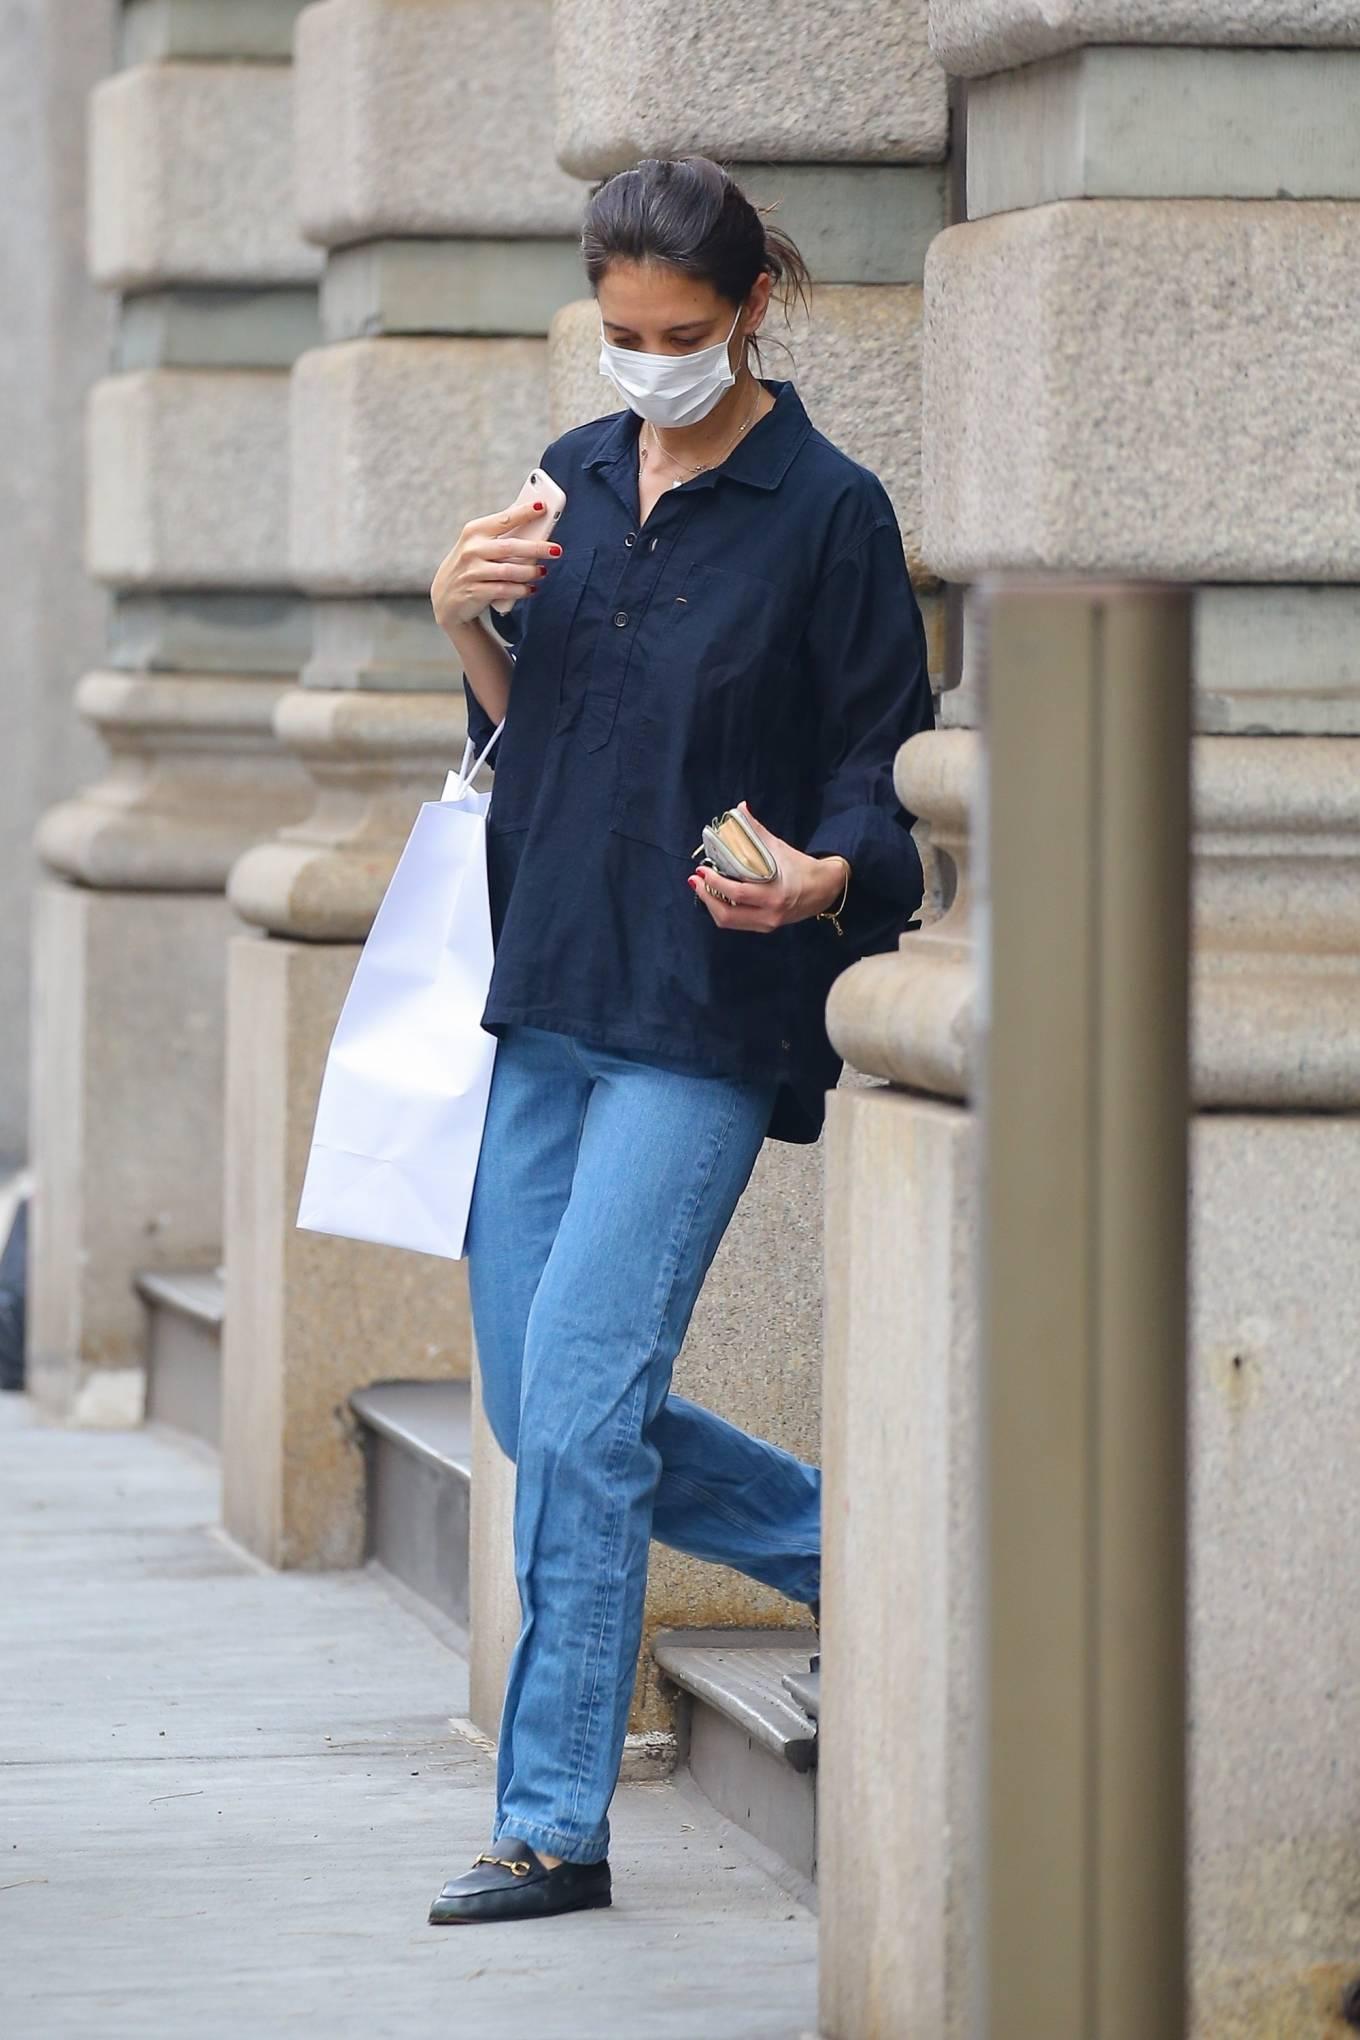 Katie Holmes - Casual in jeans and a black shirt at Santa Maria Novella in New York